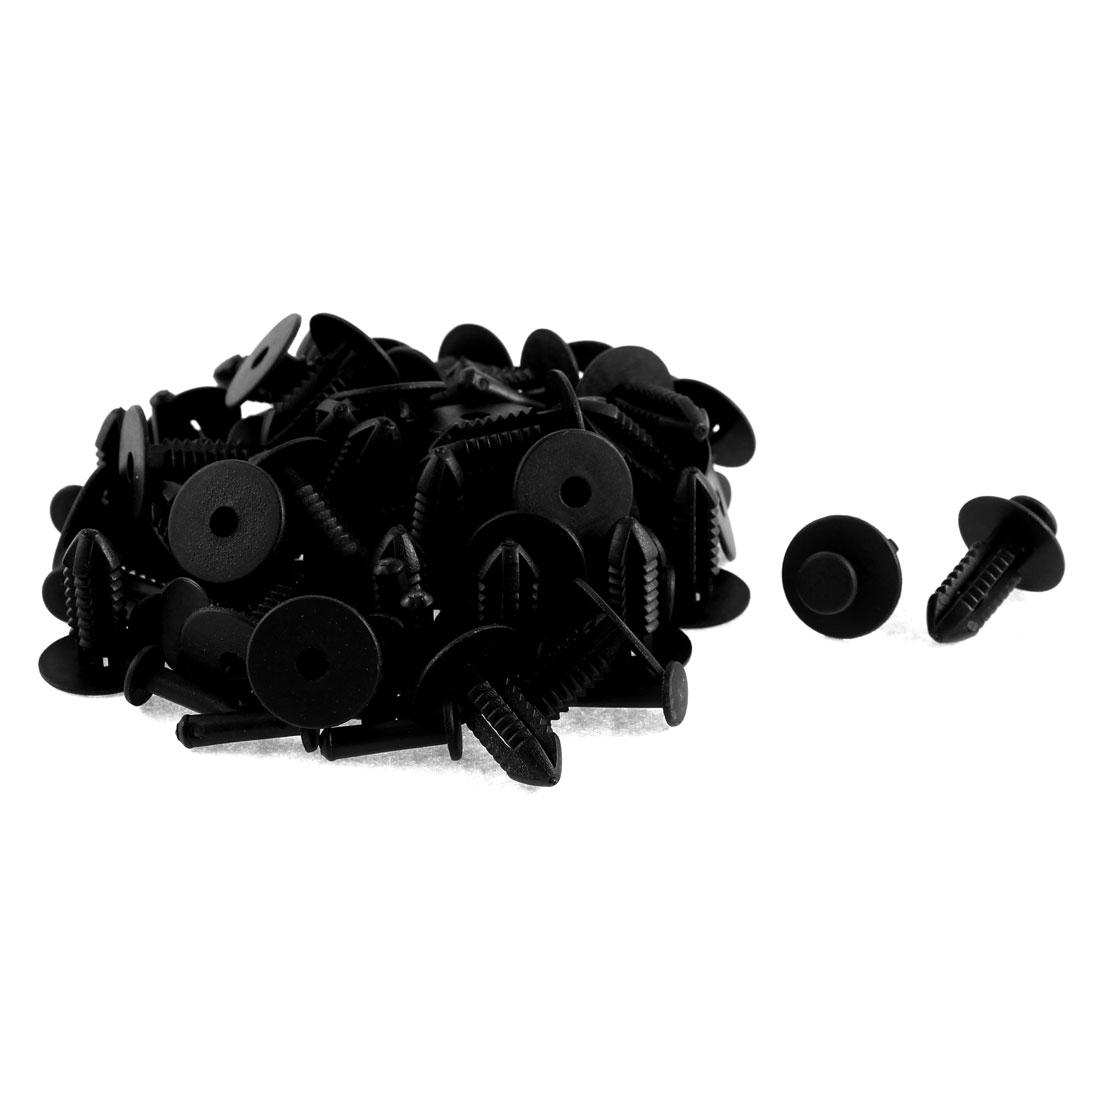 52 Pcs Black Plastic Fir Tree Auto Trim Clips for Mercedes Benz